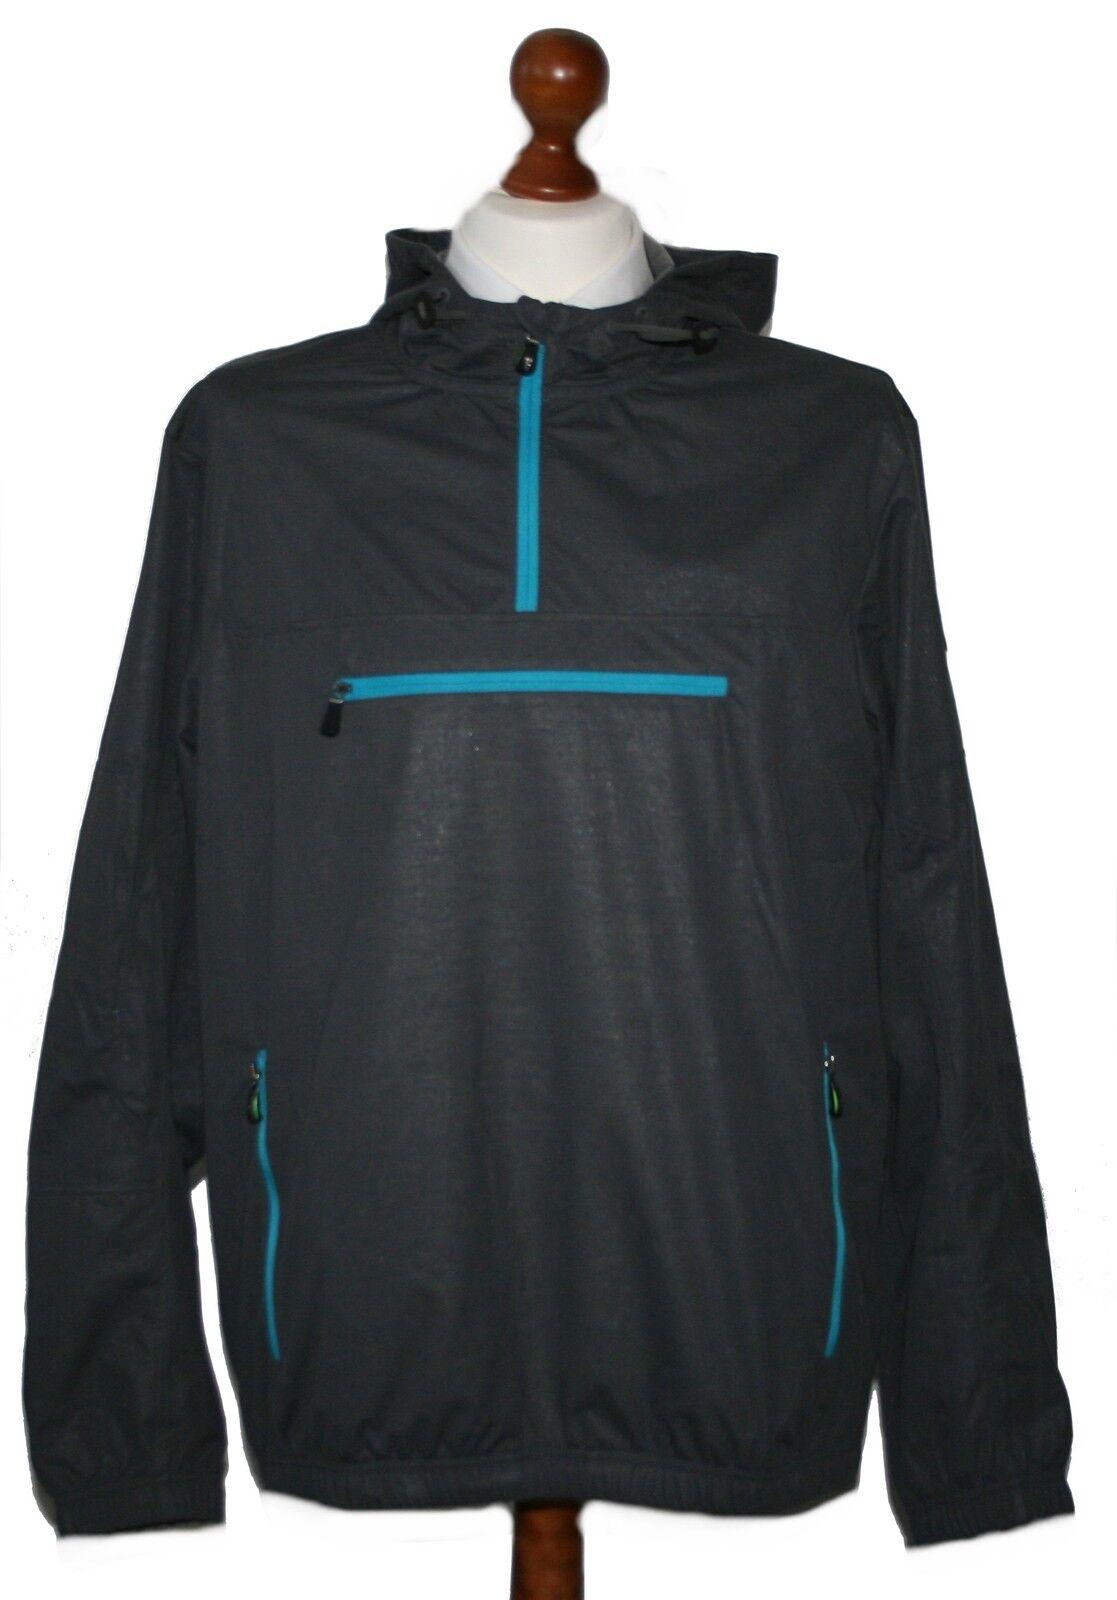 Hugo Boss 50284776 Dark grau Sannok Kapuzen Sweatschirt Pullover Gr.L & XL